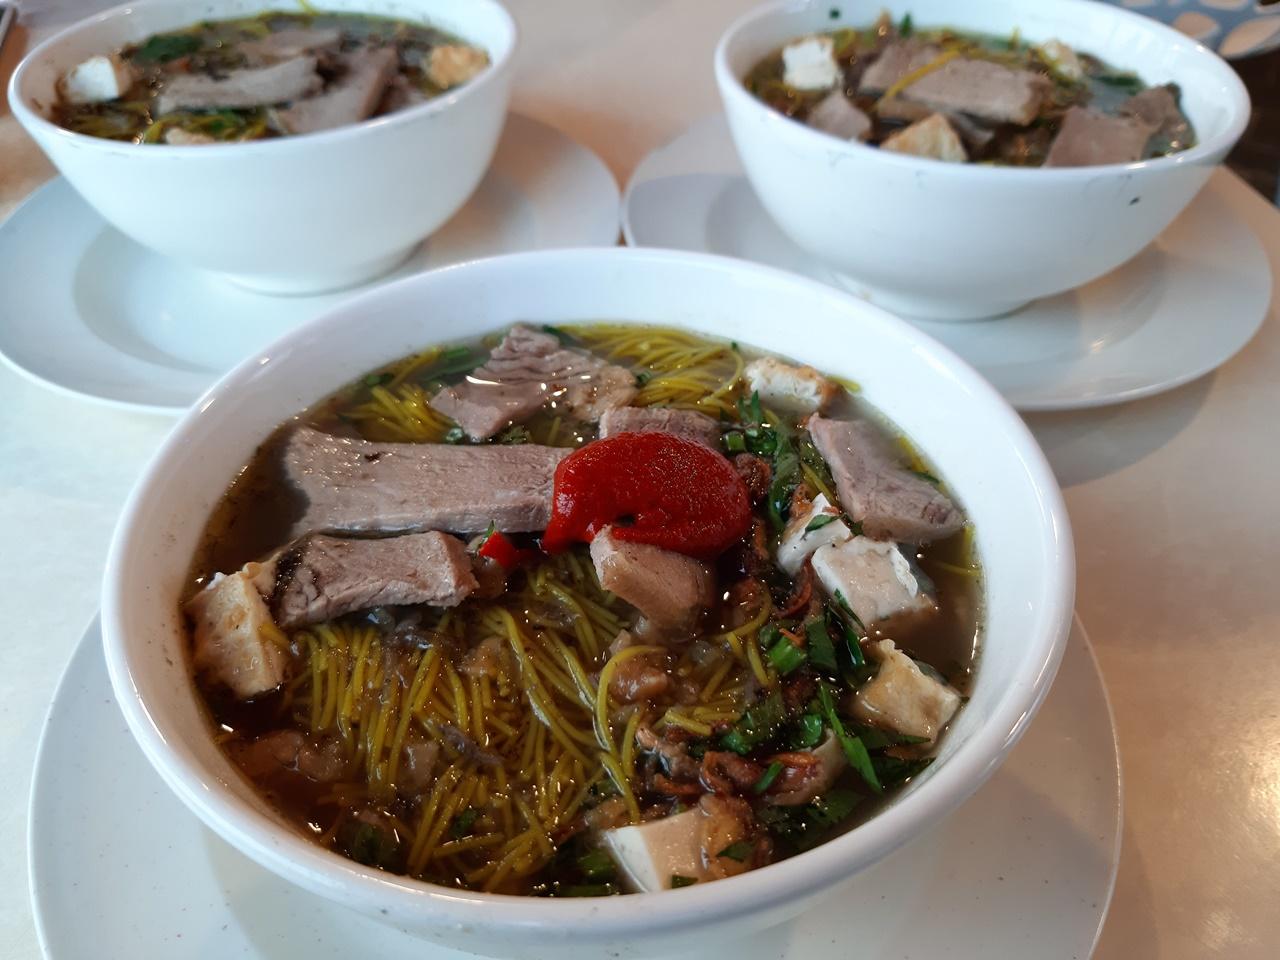 indonézska polievka na stole